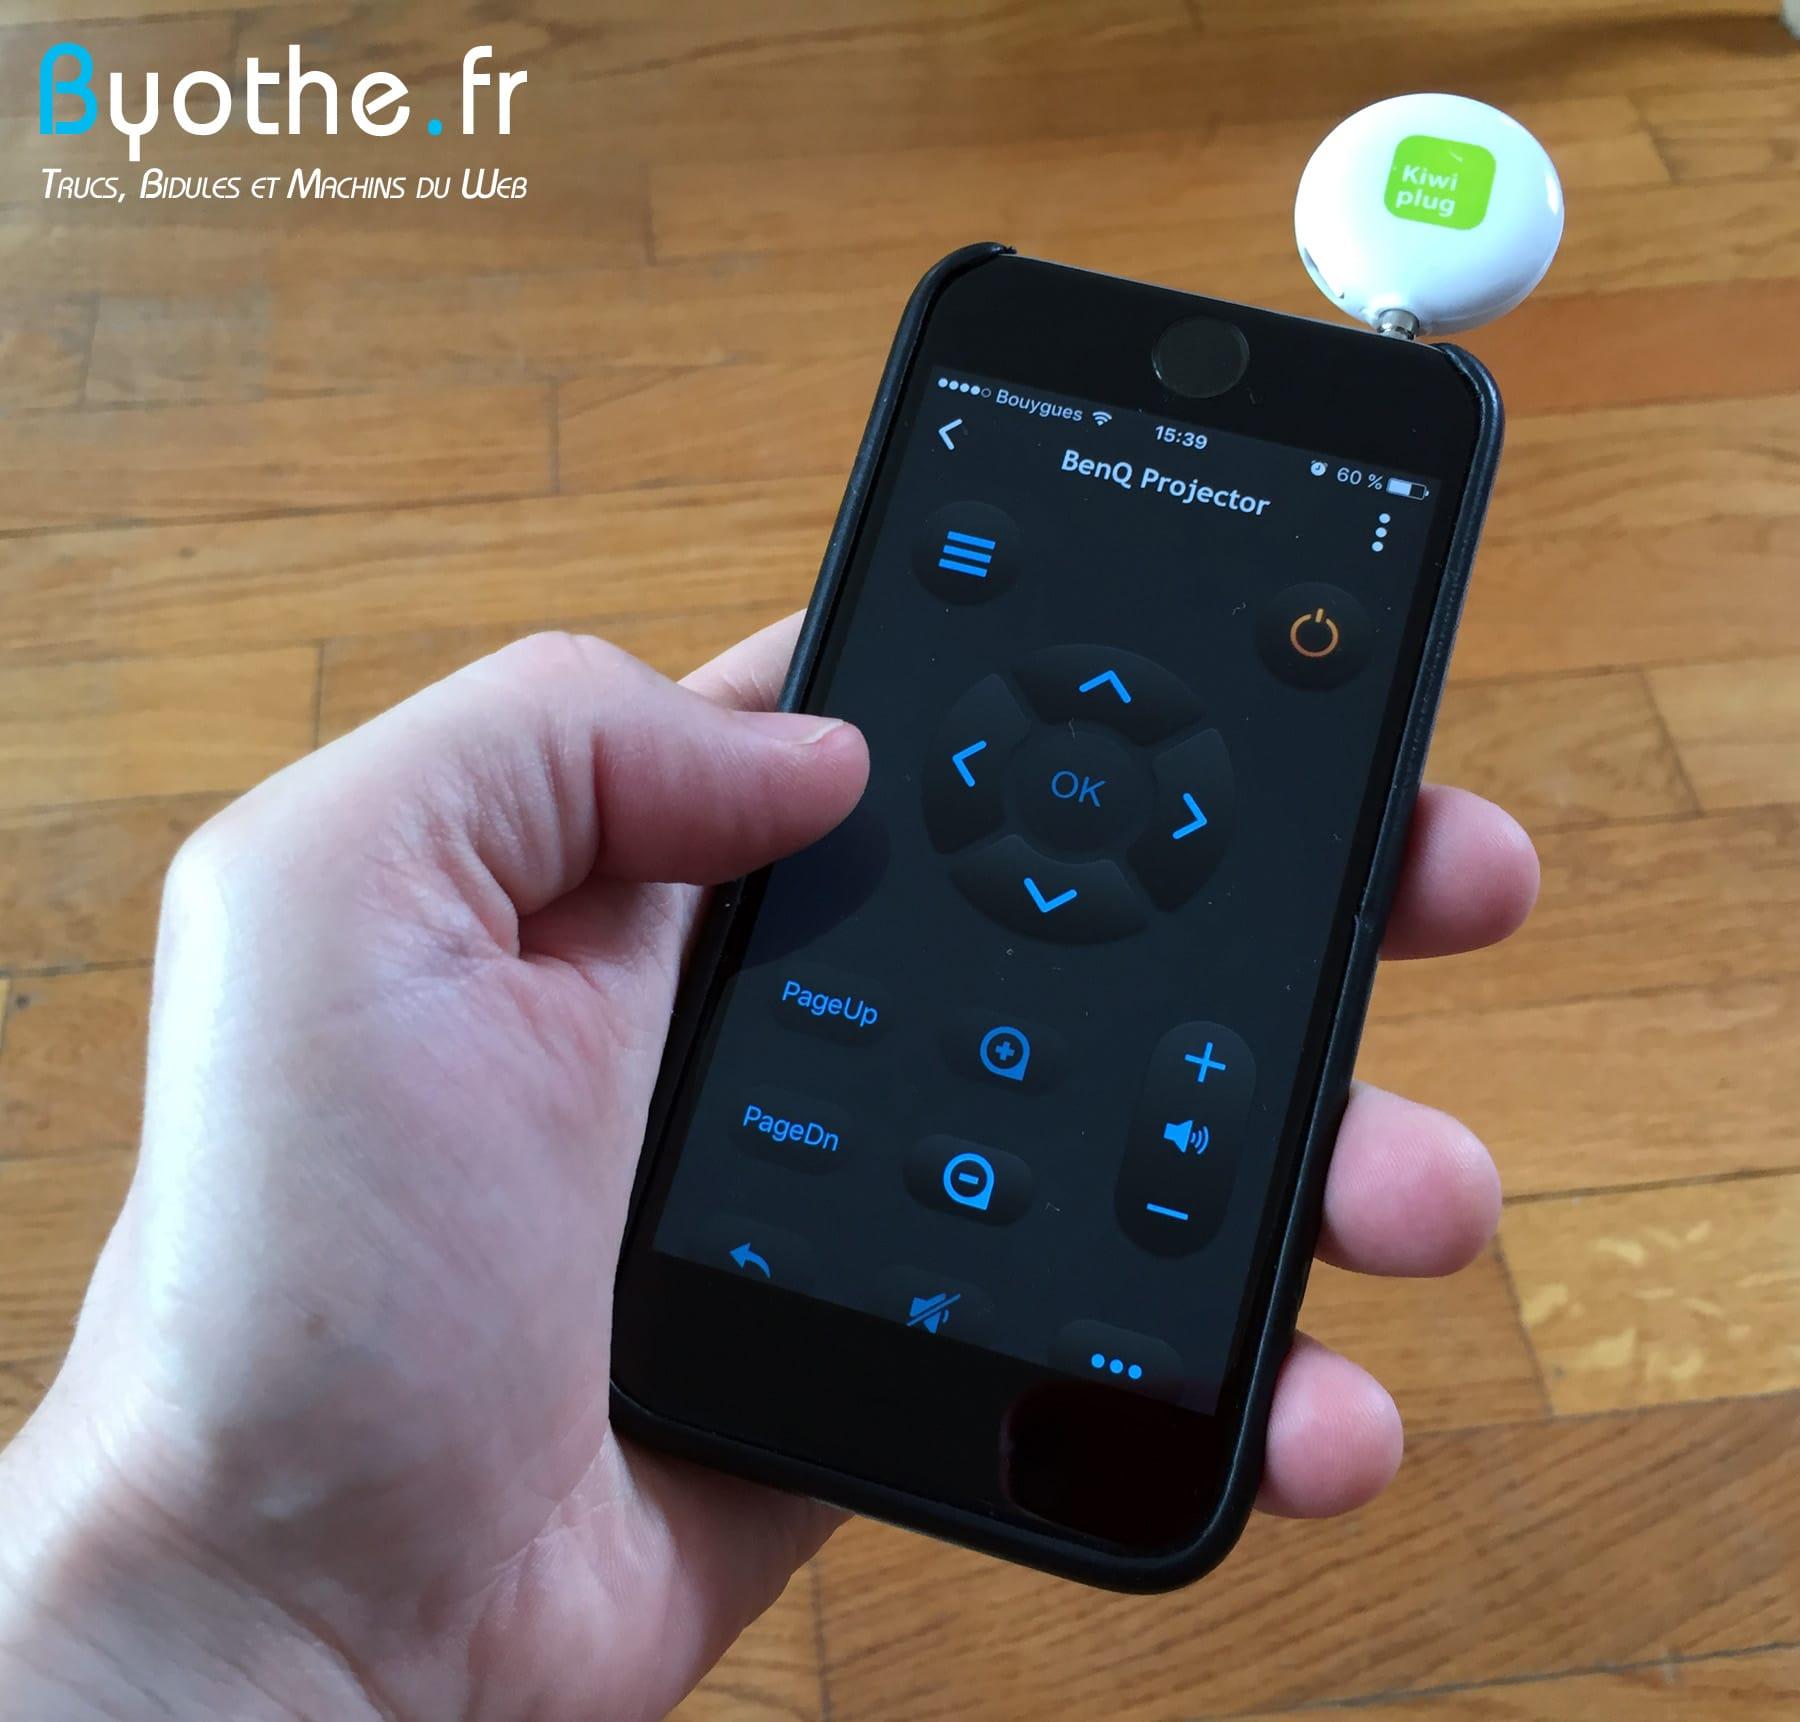 kiwi-plug-iphone2